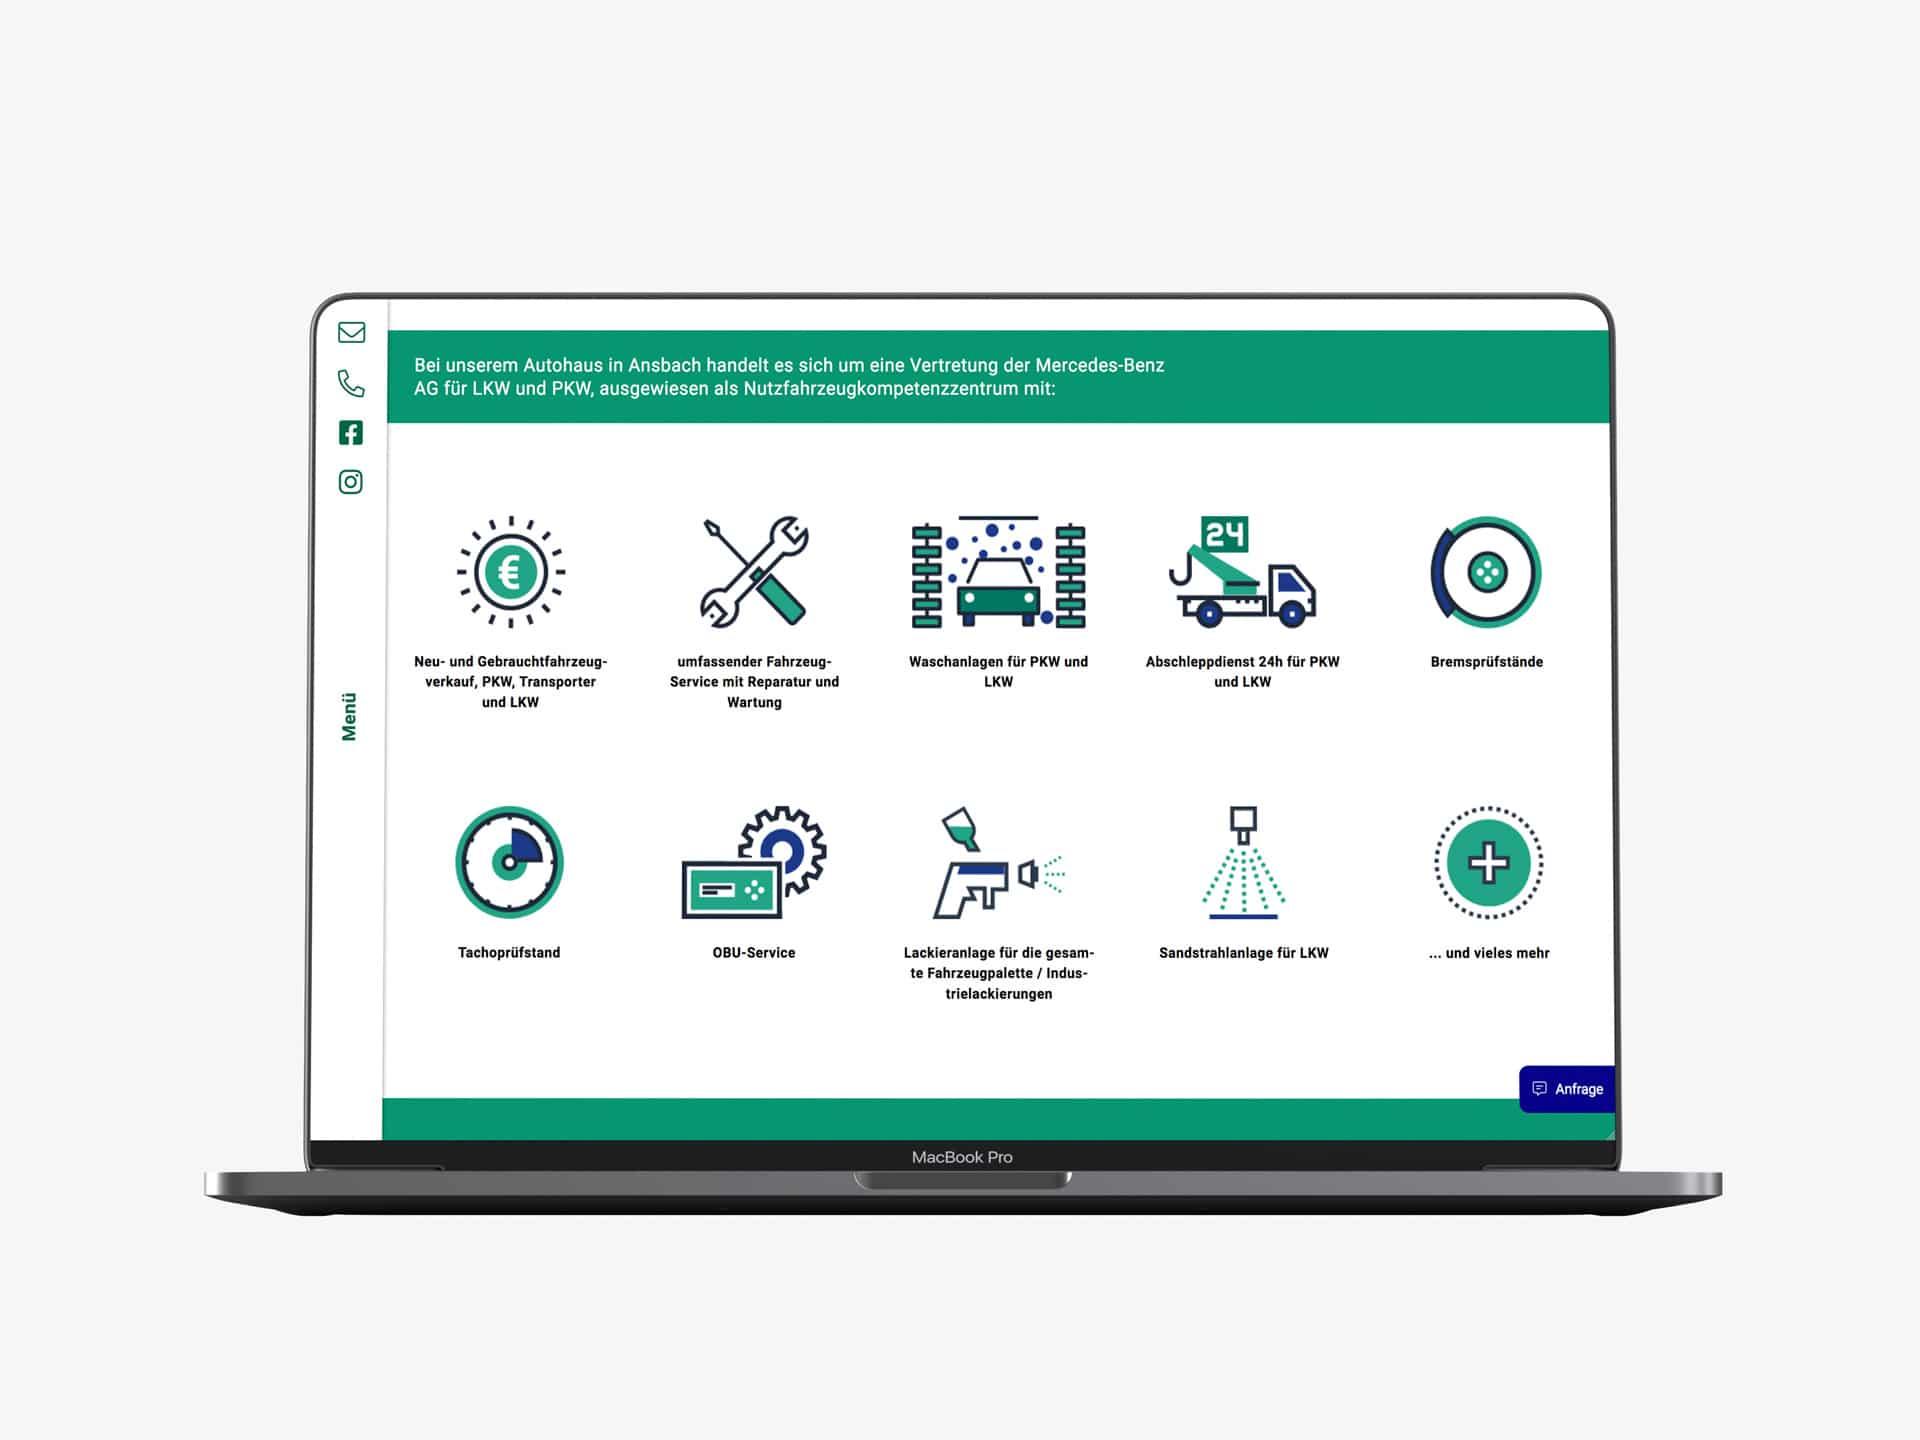 Desktop Screen Icons Leistungen Webdesign Spedition Oppel